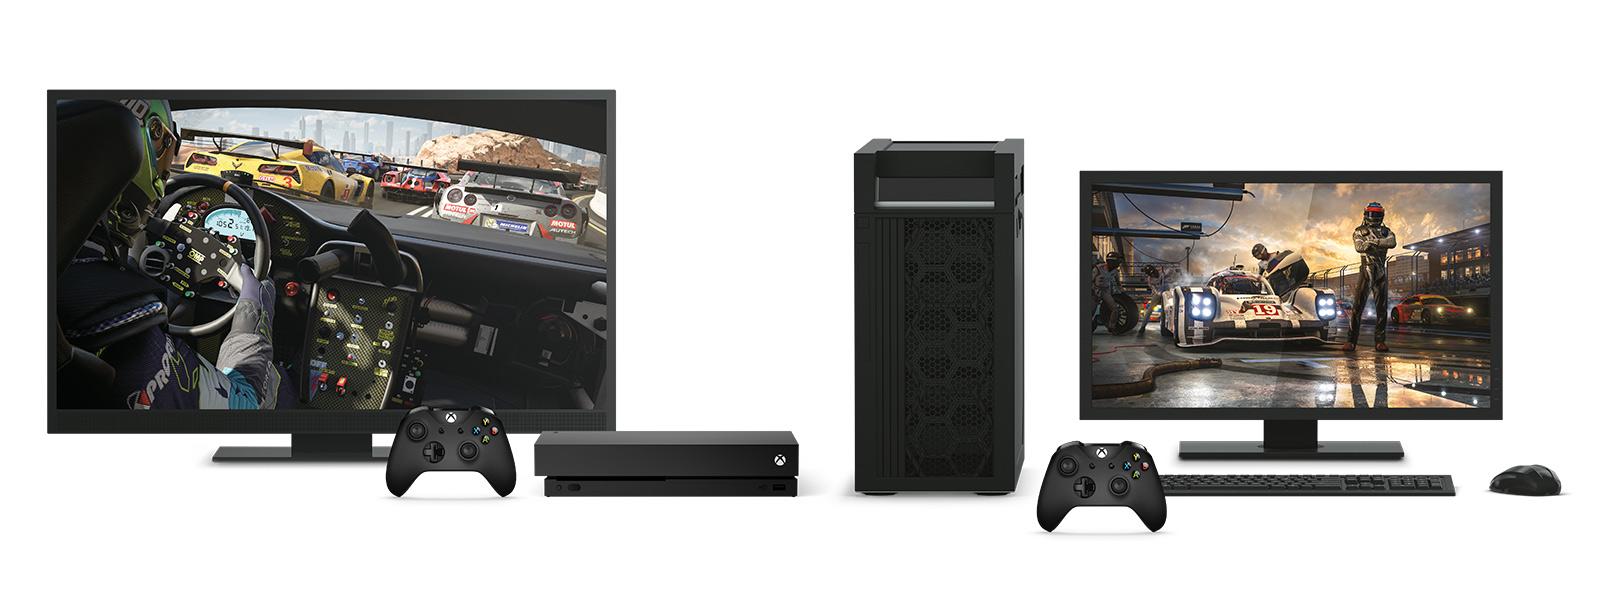 Xbox One X ומכשיר 4K Desktop עם Forza Motorsport 7 בטלוויזיה ובמחשב